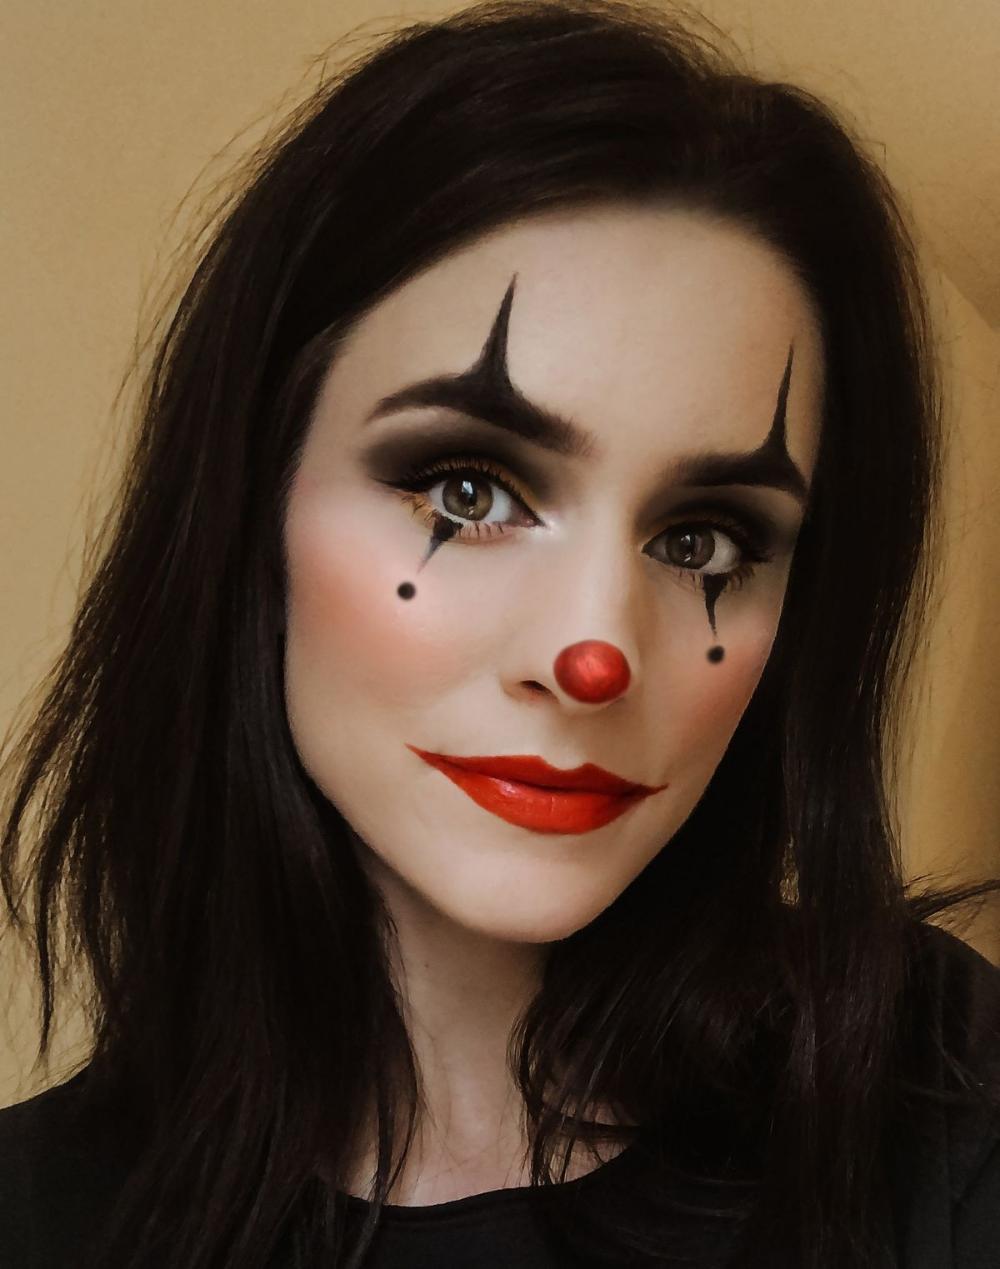 It Clown Artistry Quick Easy Halloween Makeup Ideas Inspo Inspiration Looks Amazing Halloween Makeup Creepy Halloween Makeup Halloween Makeup Clown